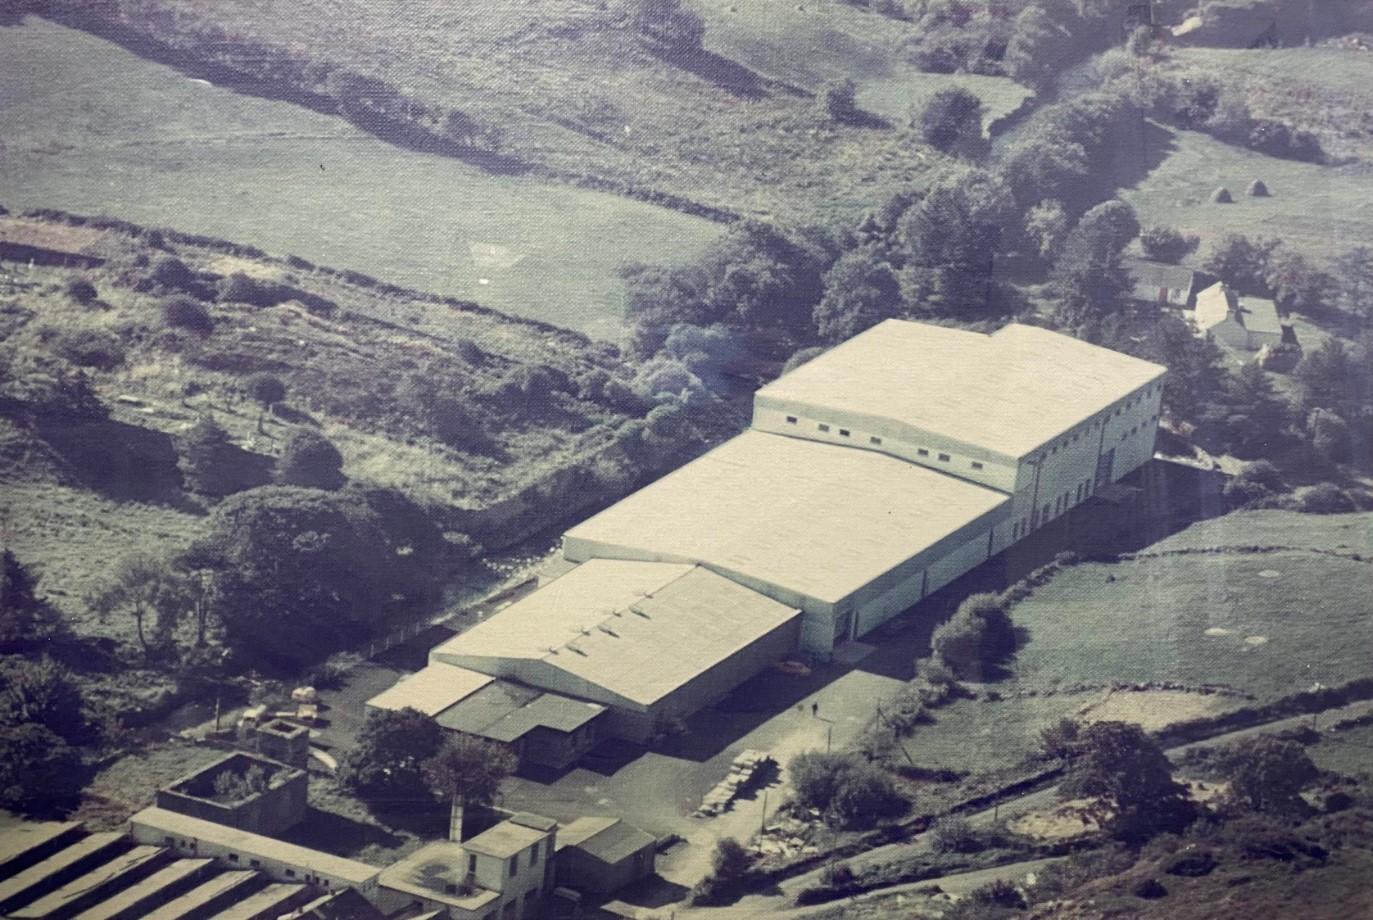 Donegal Yarns mill in Kilcar, built in 1970s